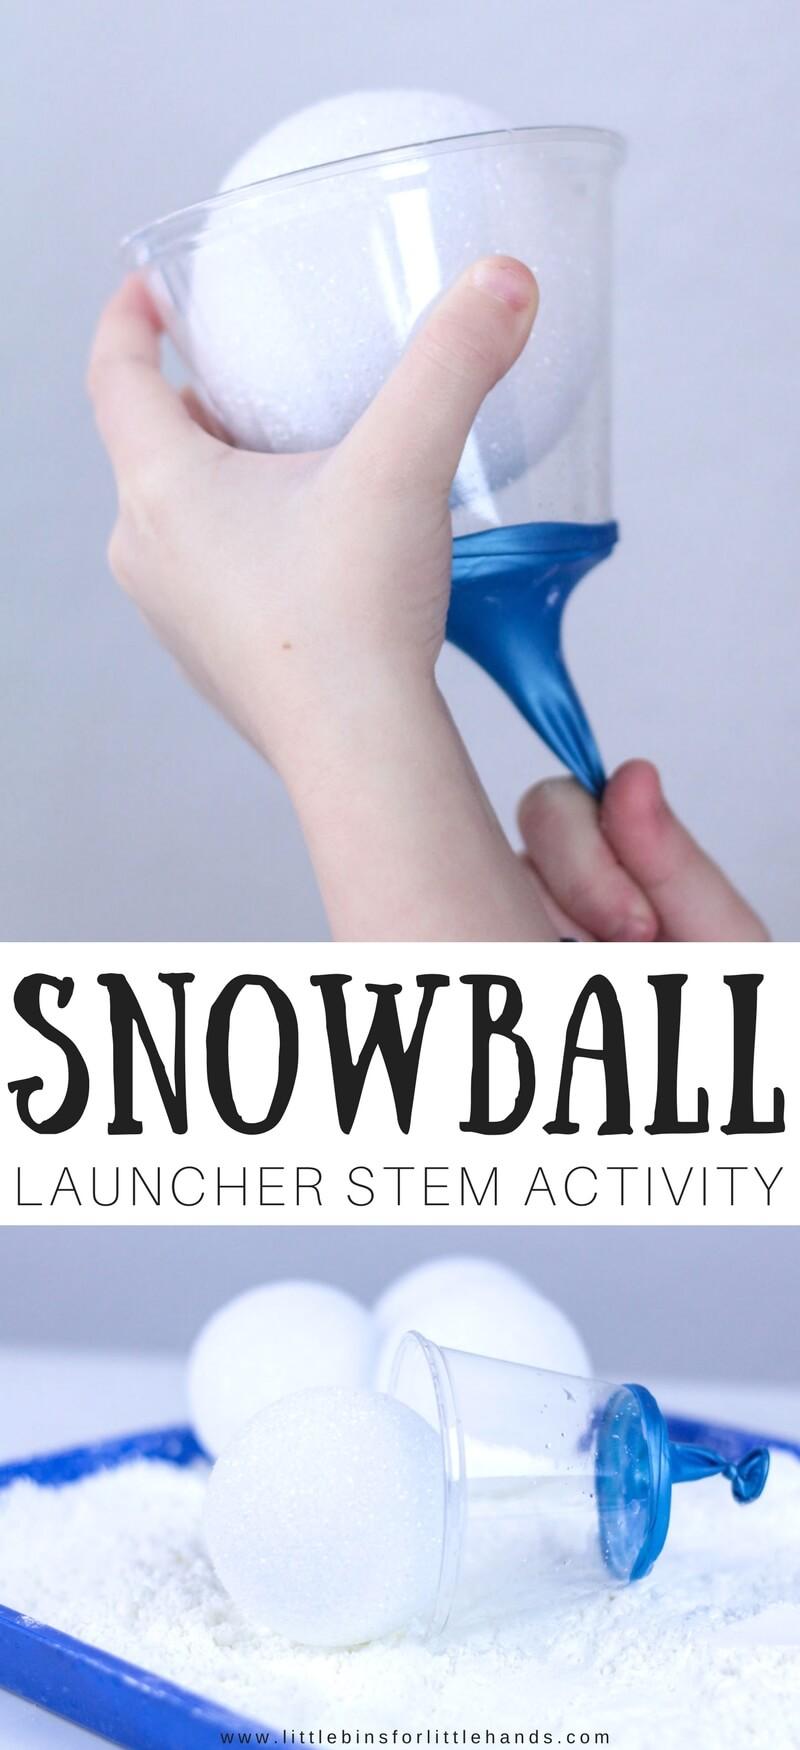 Make Snowball Launcher Winter STEM Activity for Kids